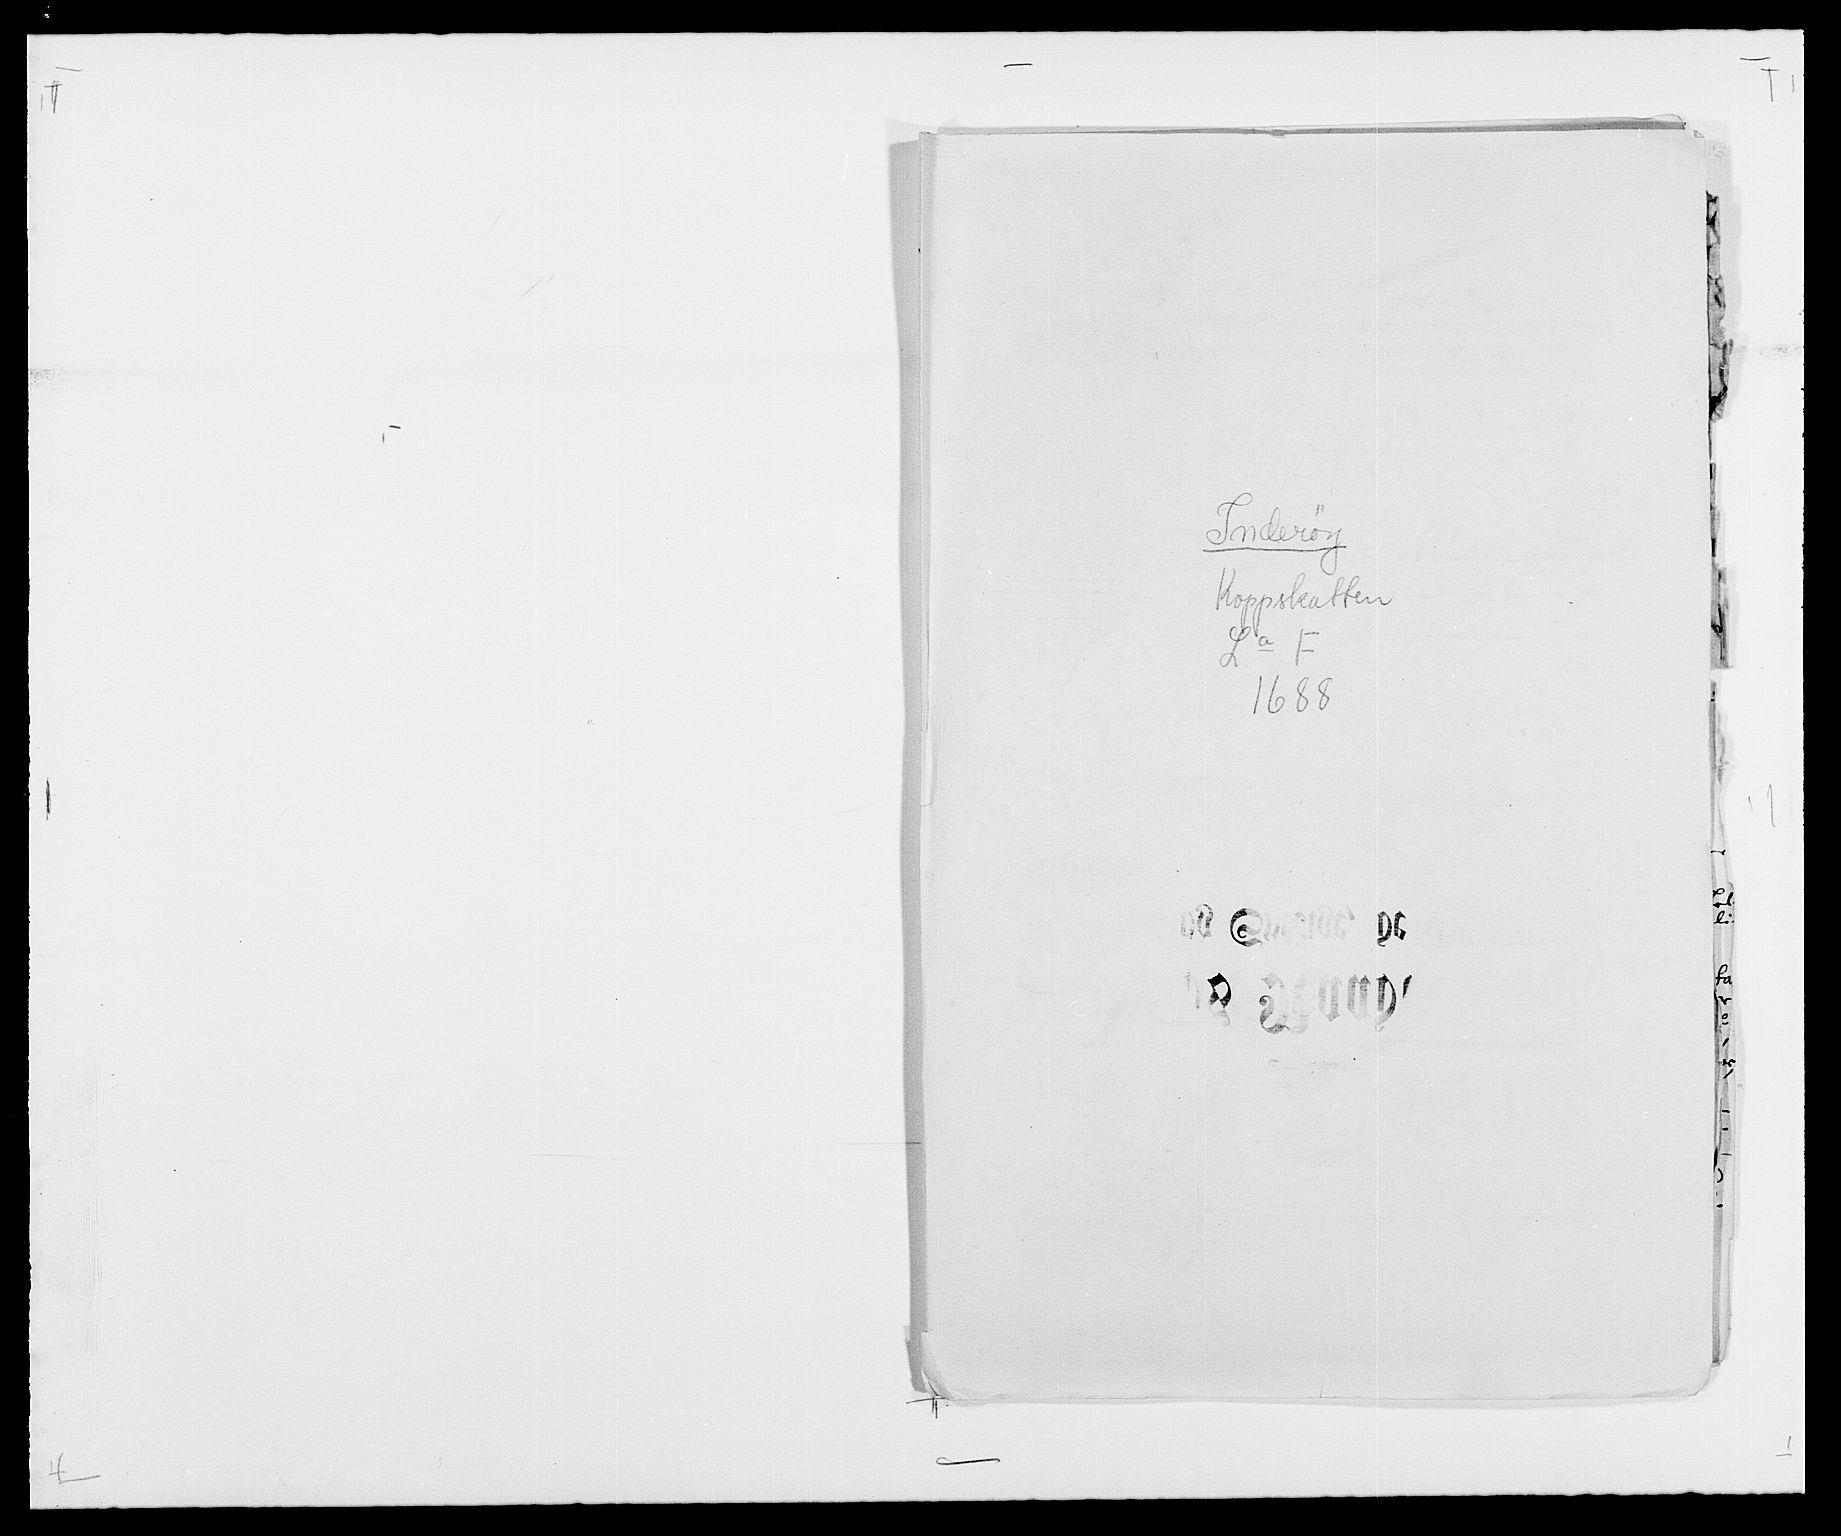 RA, Rentekammeret inntil 1814, Reviderte regnskaper, Fogderegnskap, R63/L4306: Fogderegnskap Inderøy, 1687-1689, s. 268